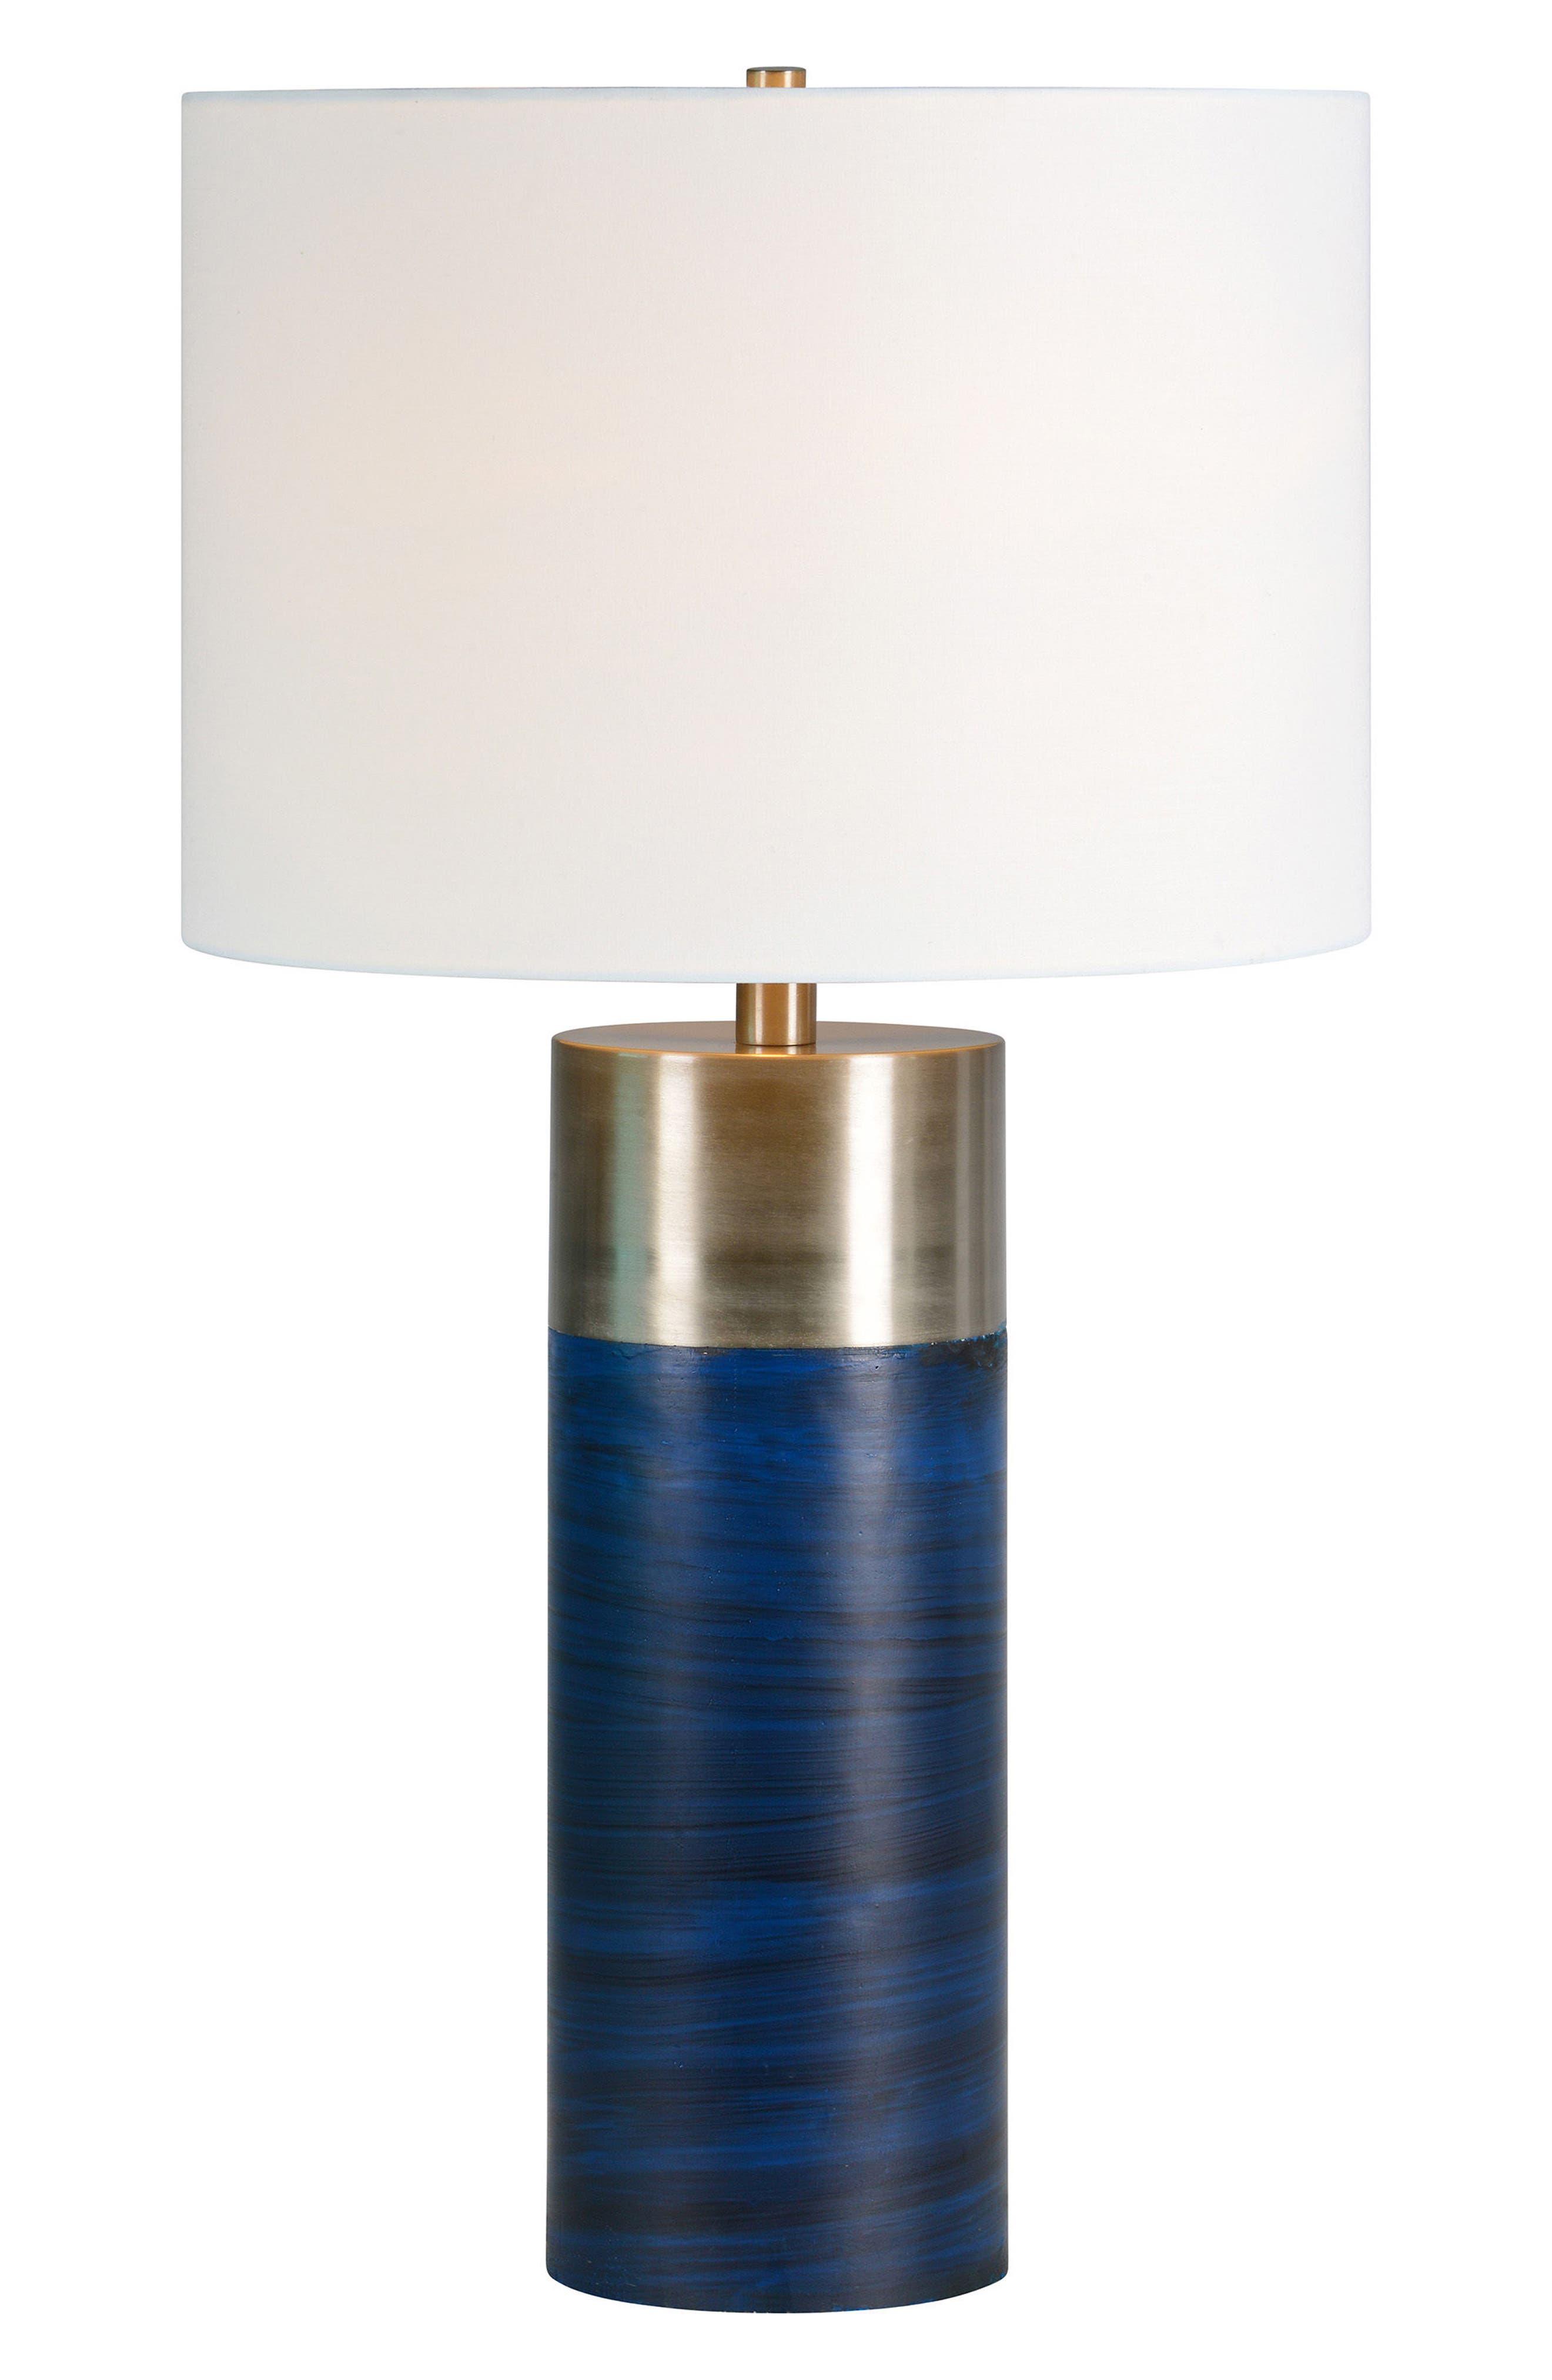 Glint Table Lamp,                             Main thumbnail 1, color,                             400